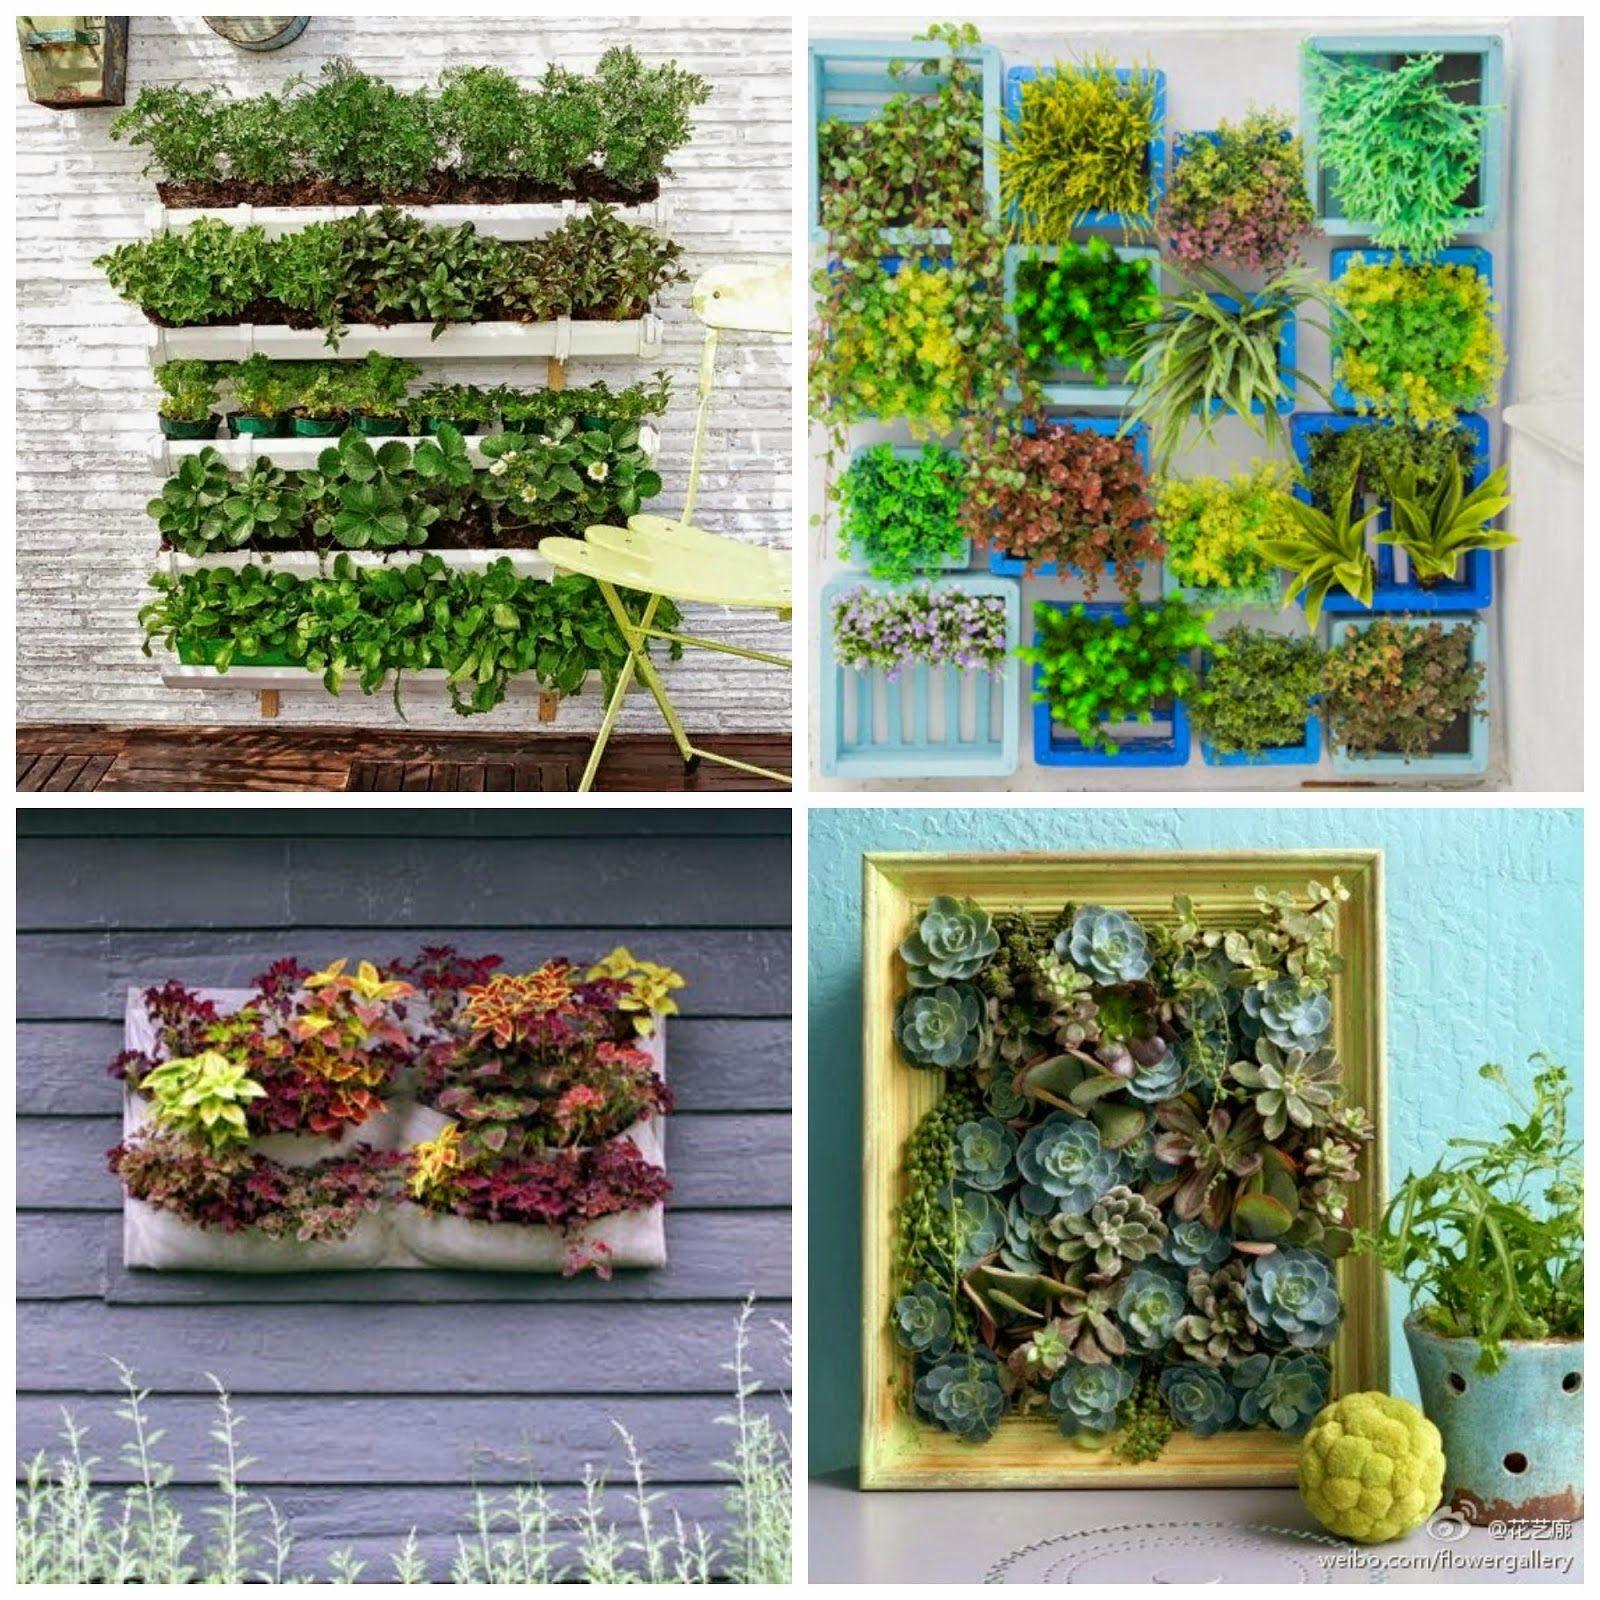 Diy jardines verticales jardines terrazas balcones y for Jardines verticales en balcones